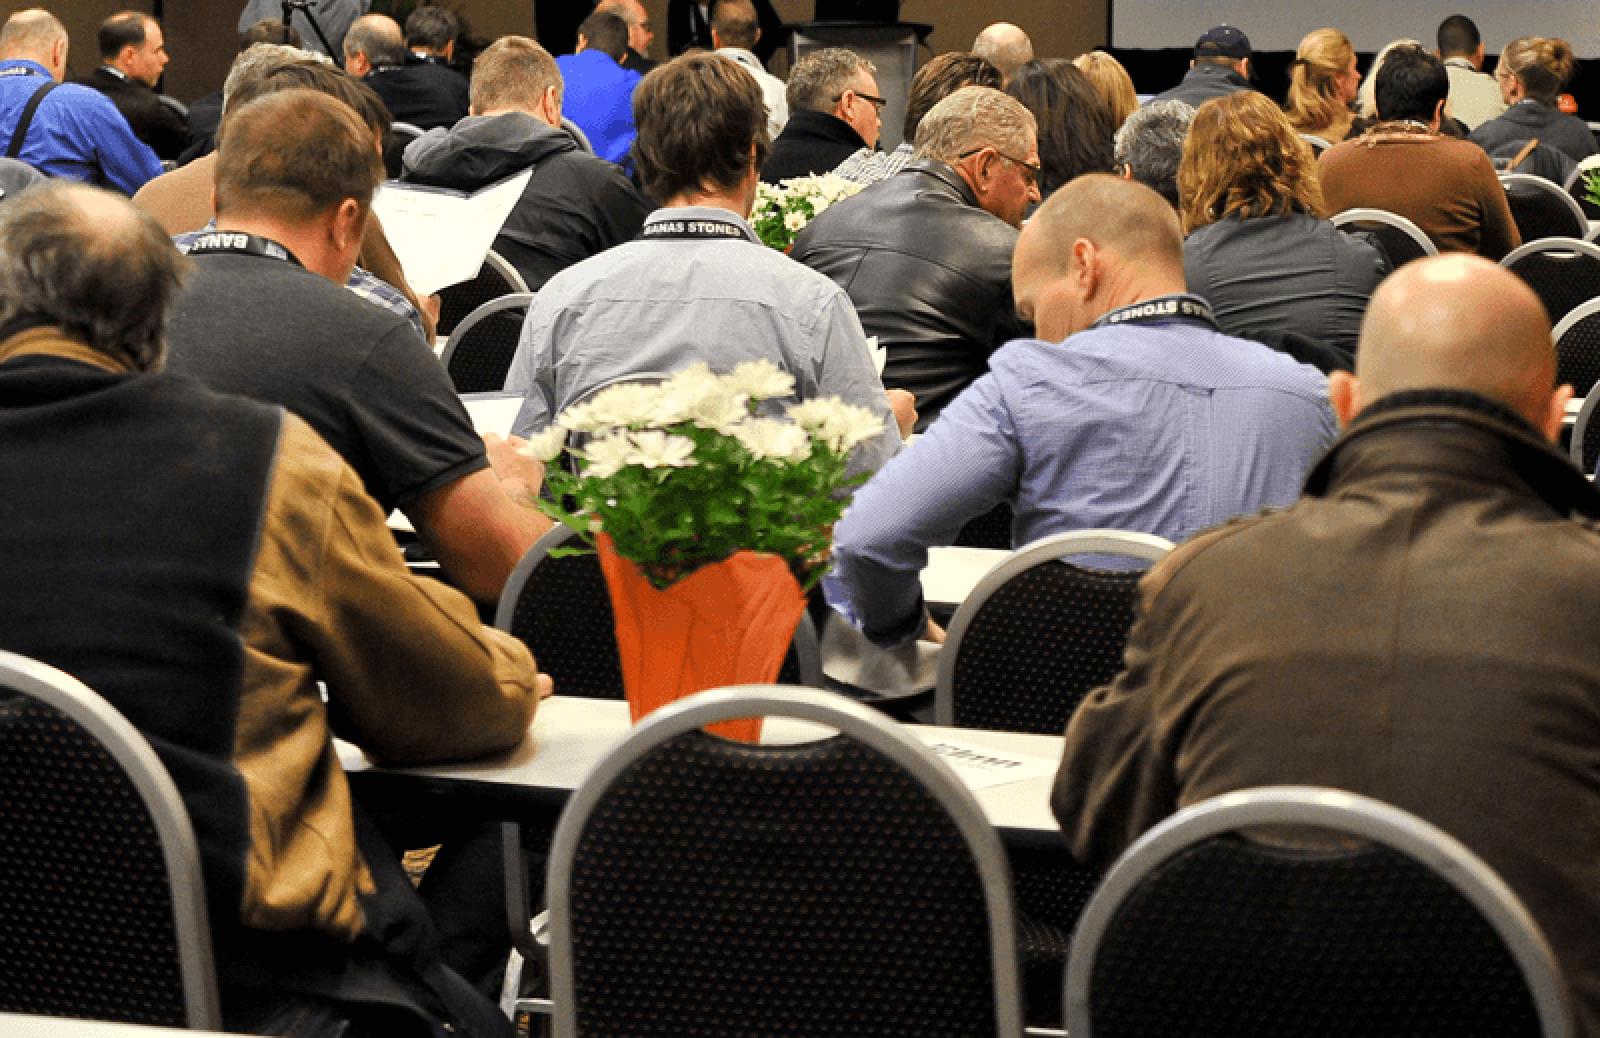 Conferences are illuminating